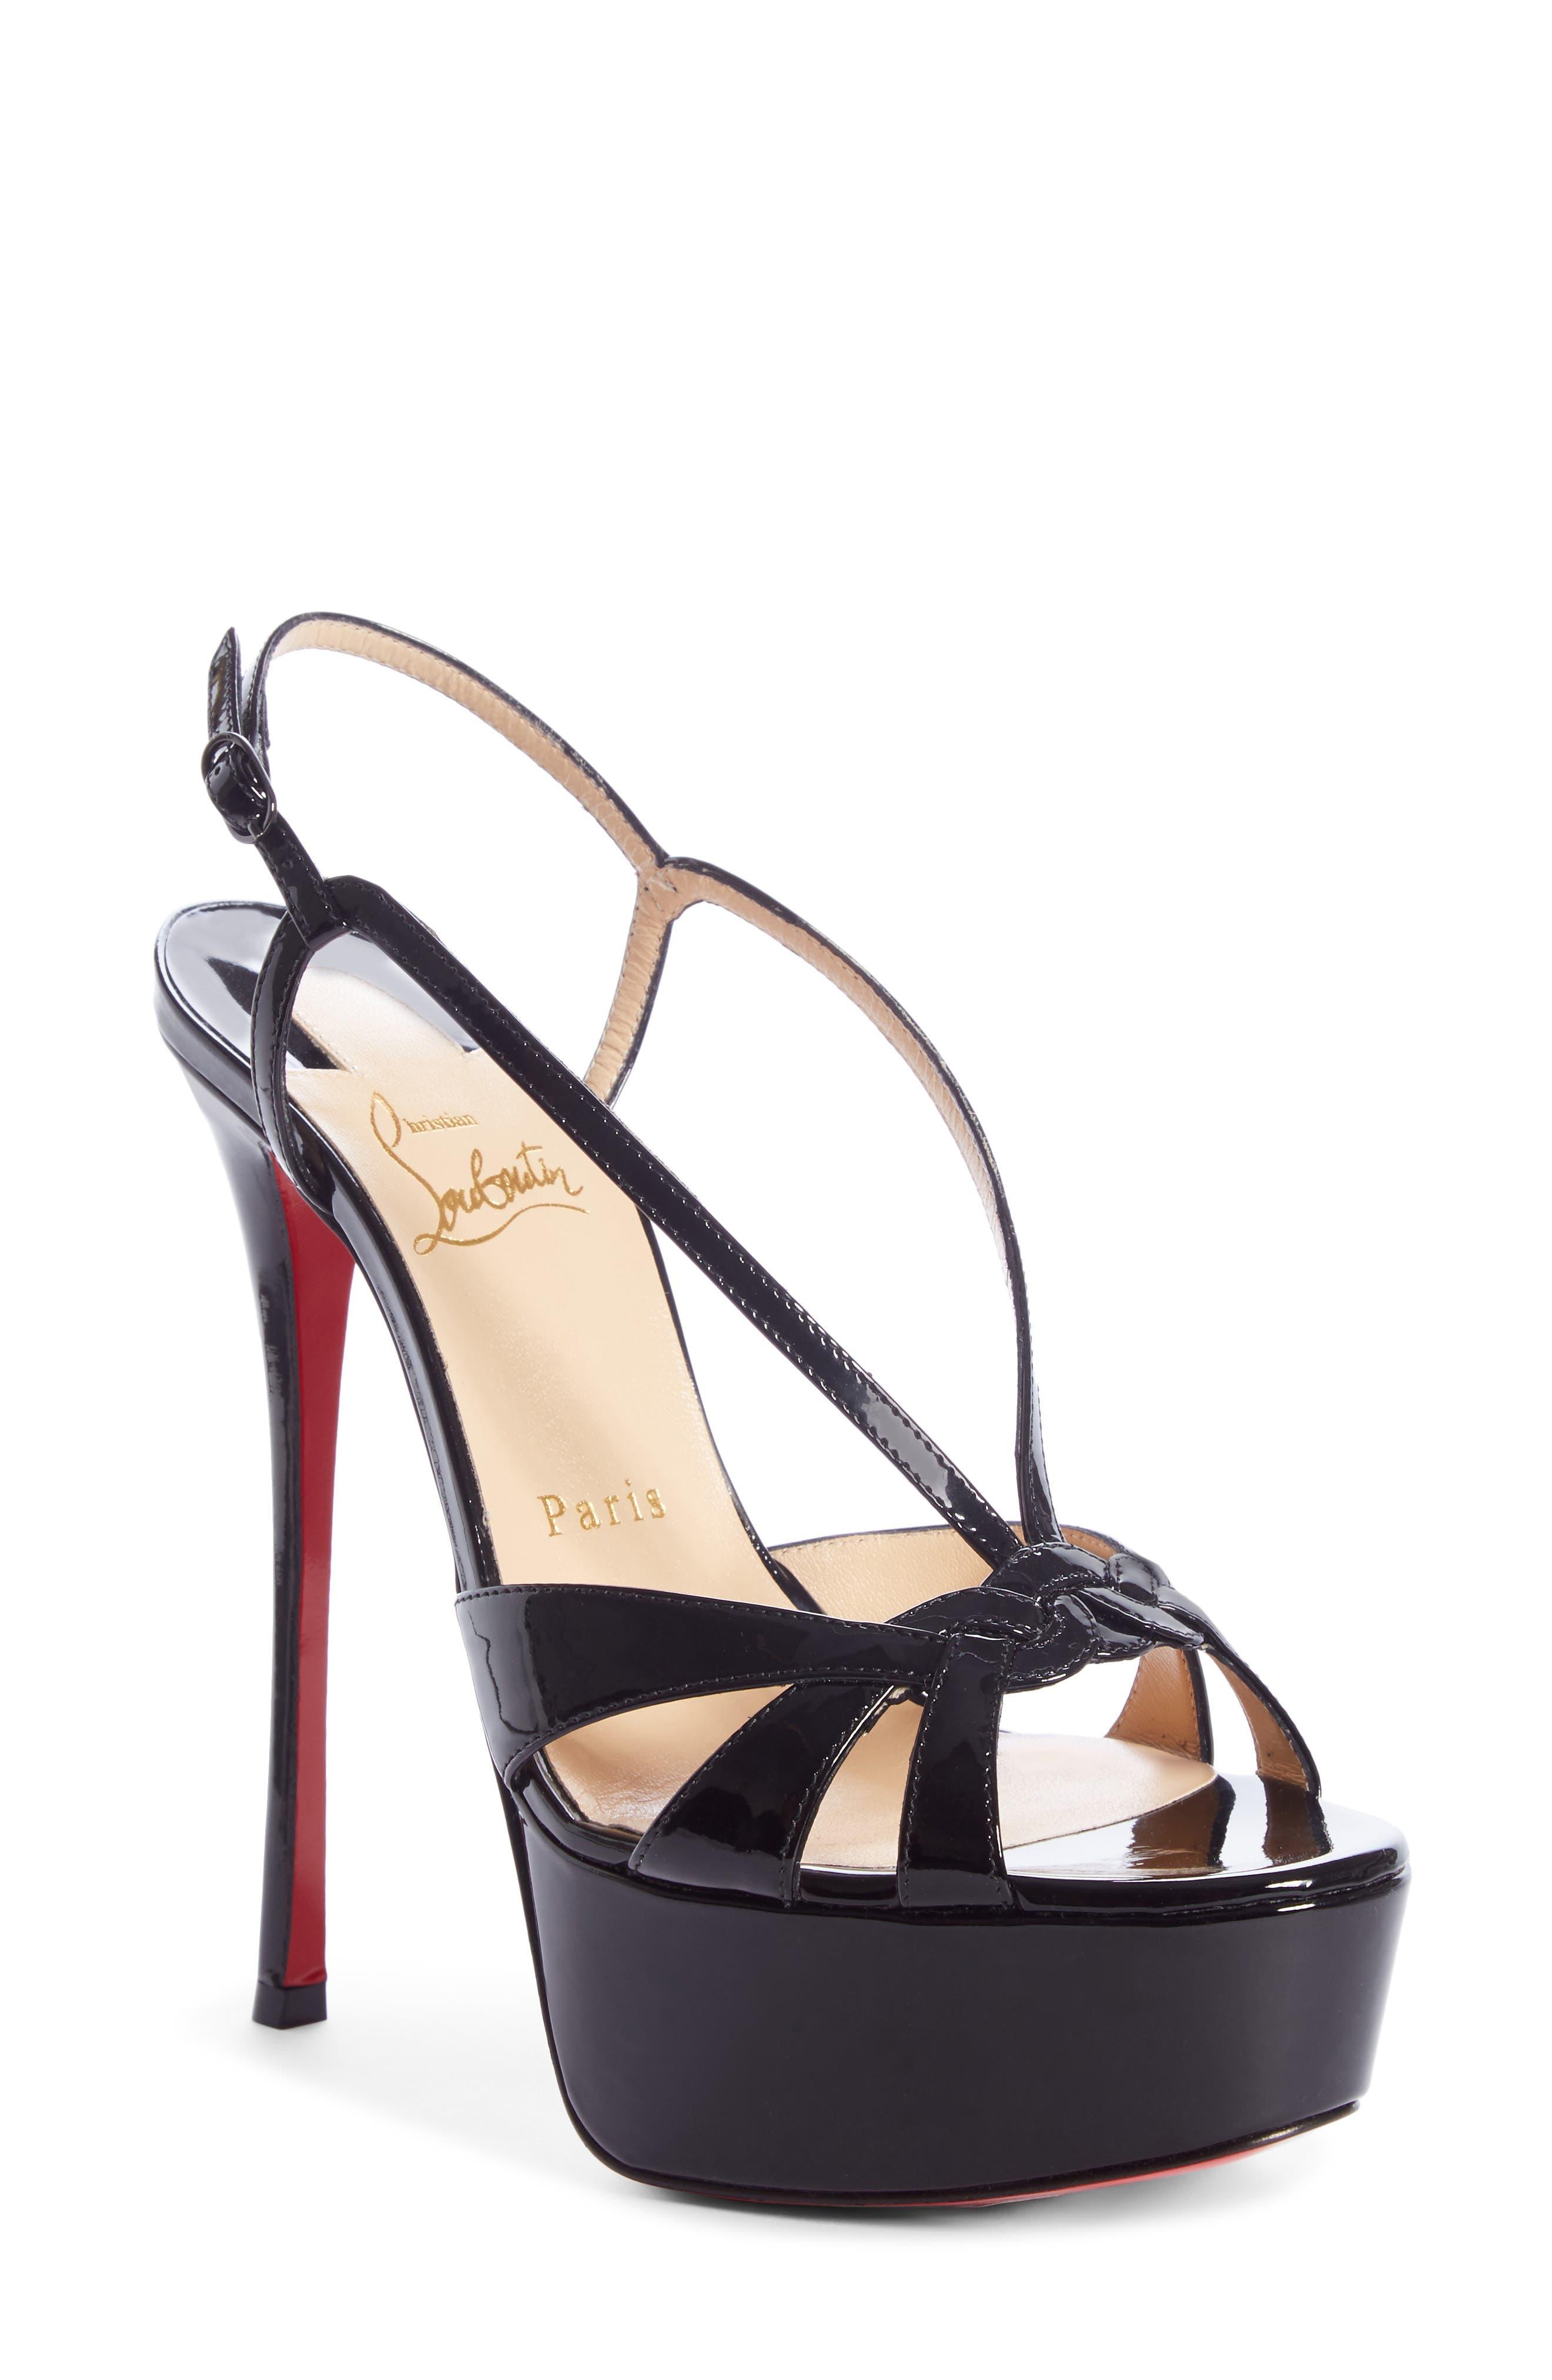 CHRISTIAN LOUBOUTIN Veracite Platform Sandal, Main, color, BLACK PATENT